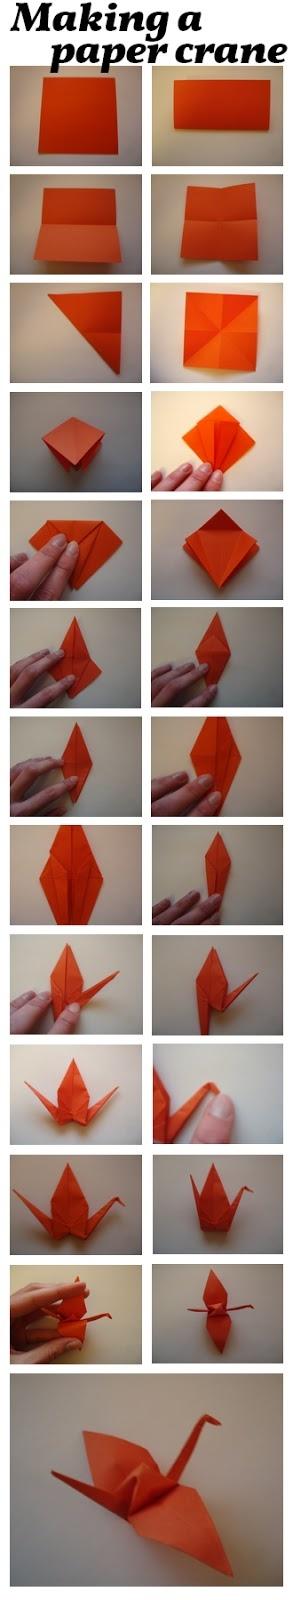 DIY: Folding a paper crane